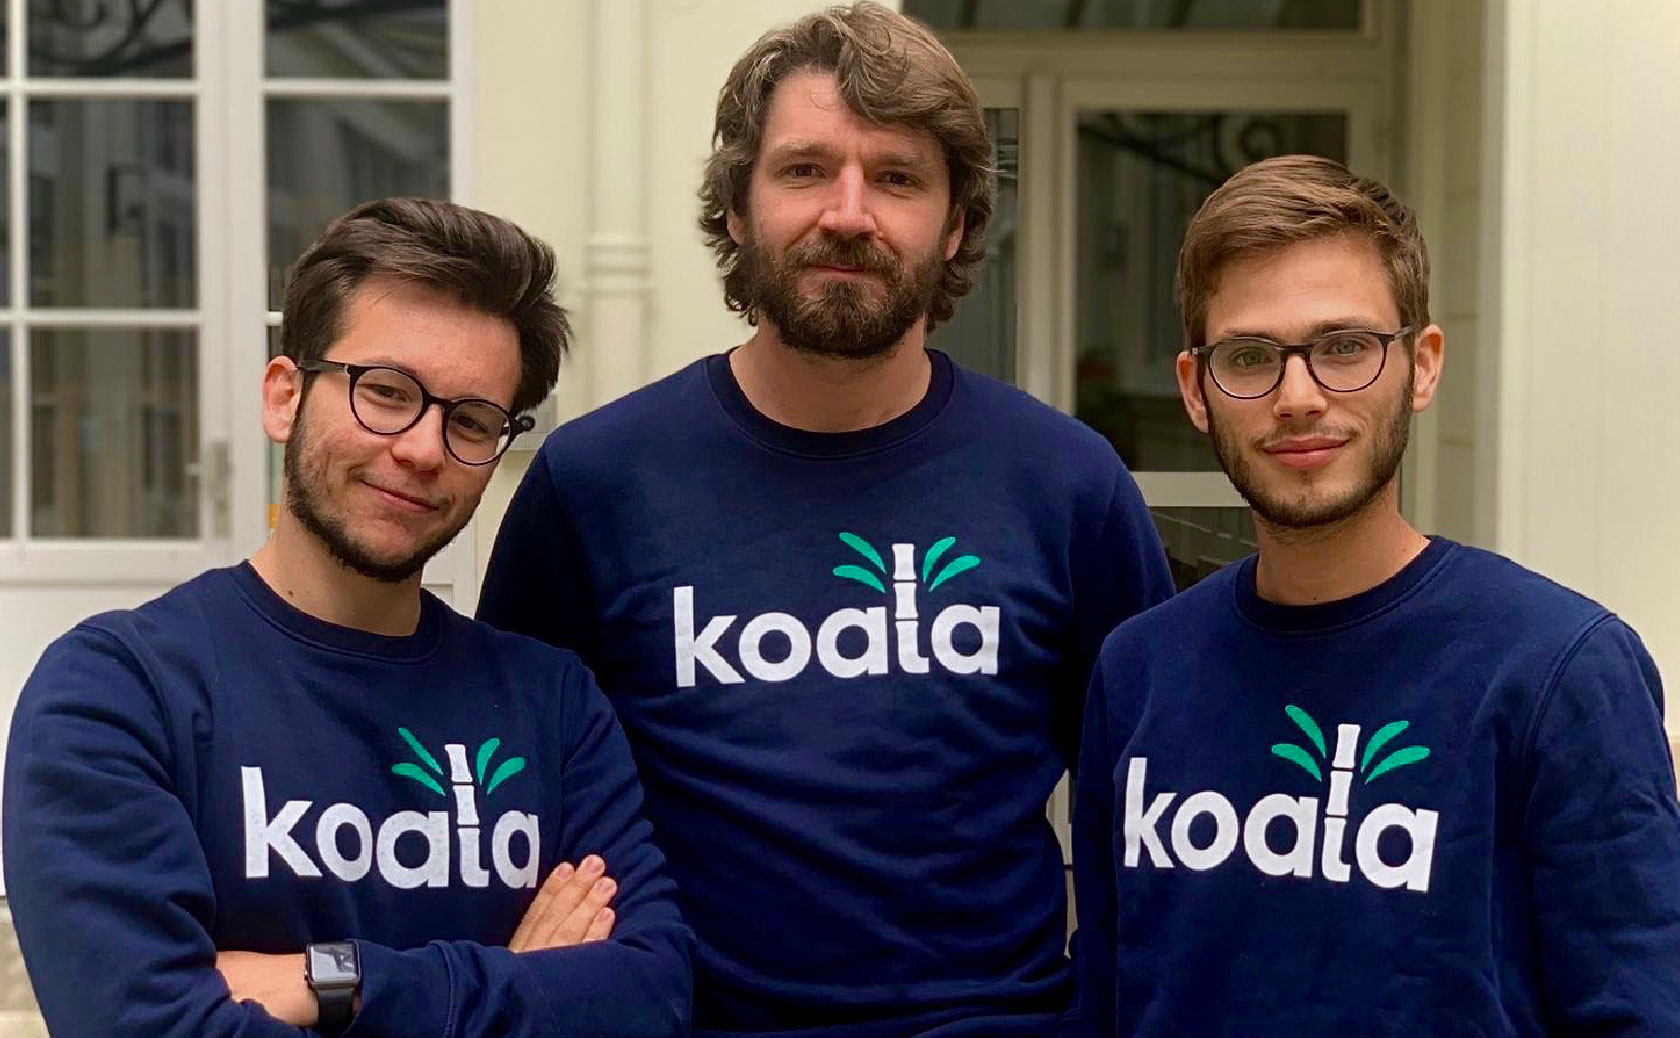 Insurtech : Koala lève 1,6M d'euros